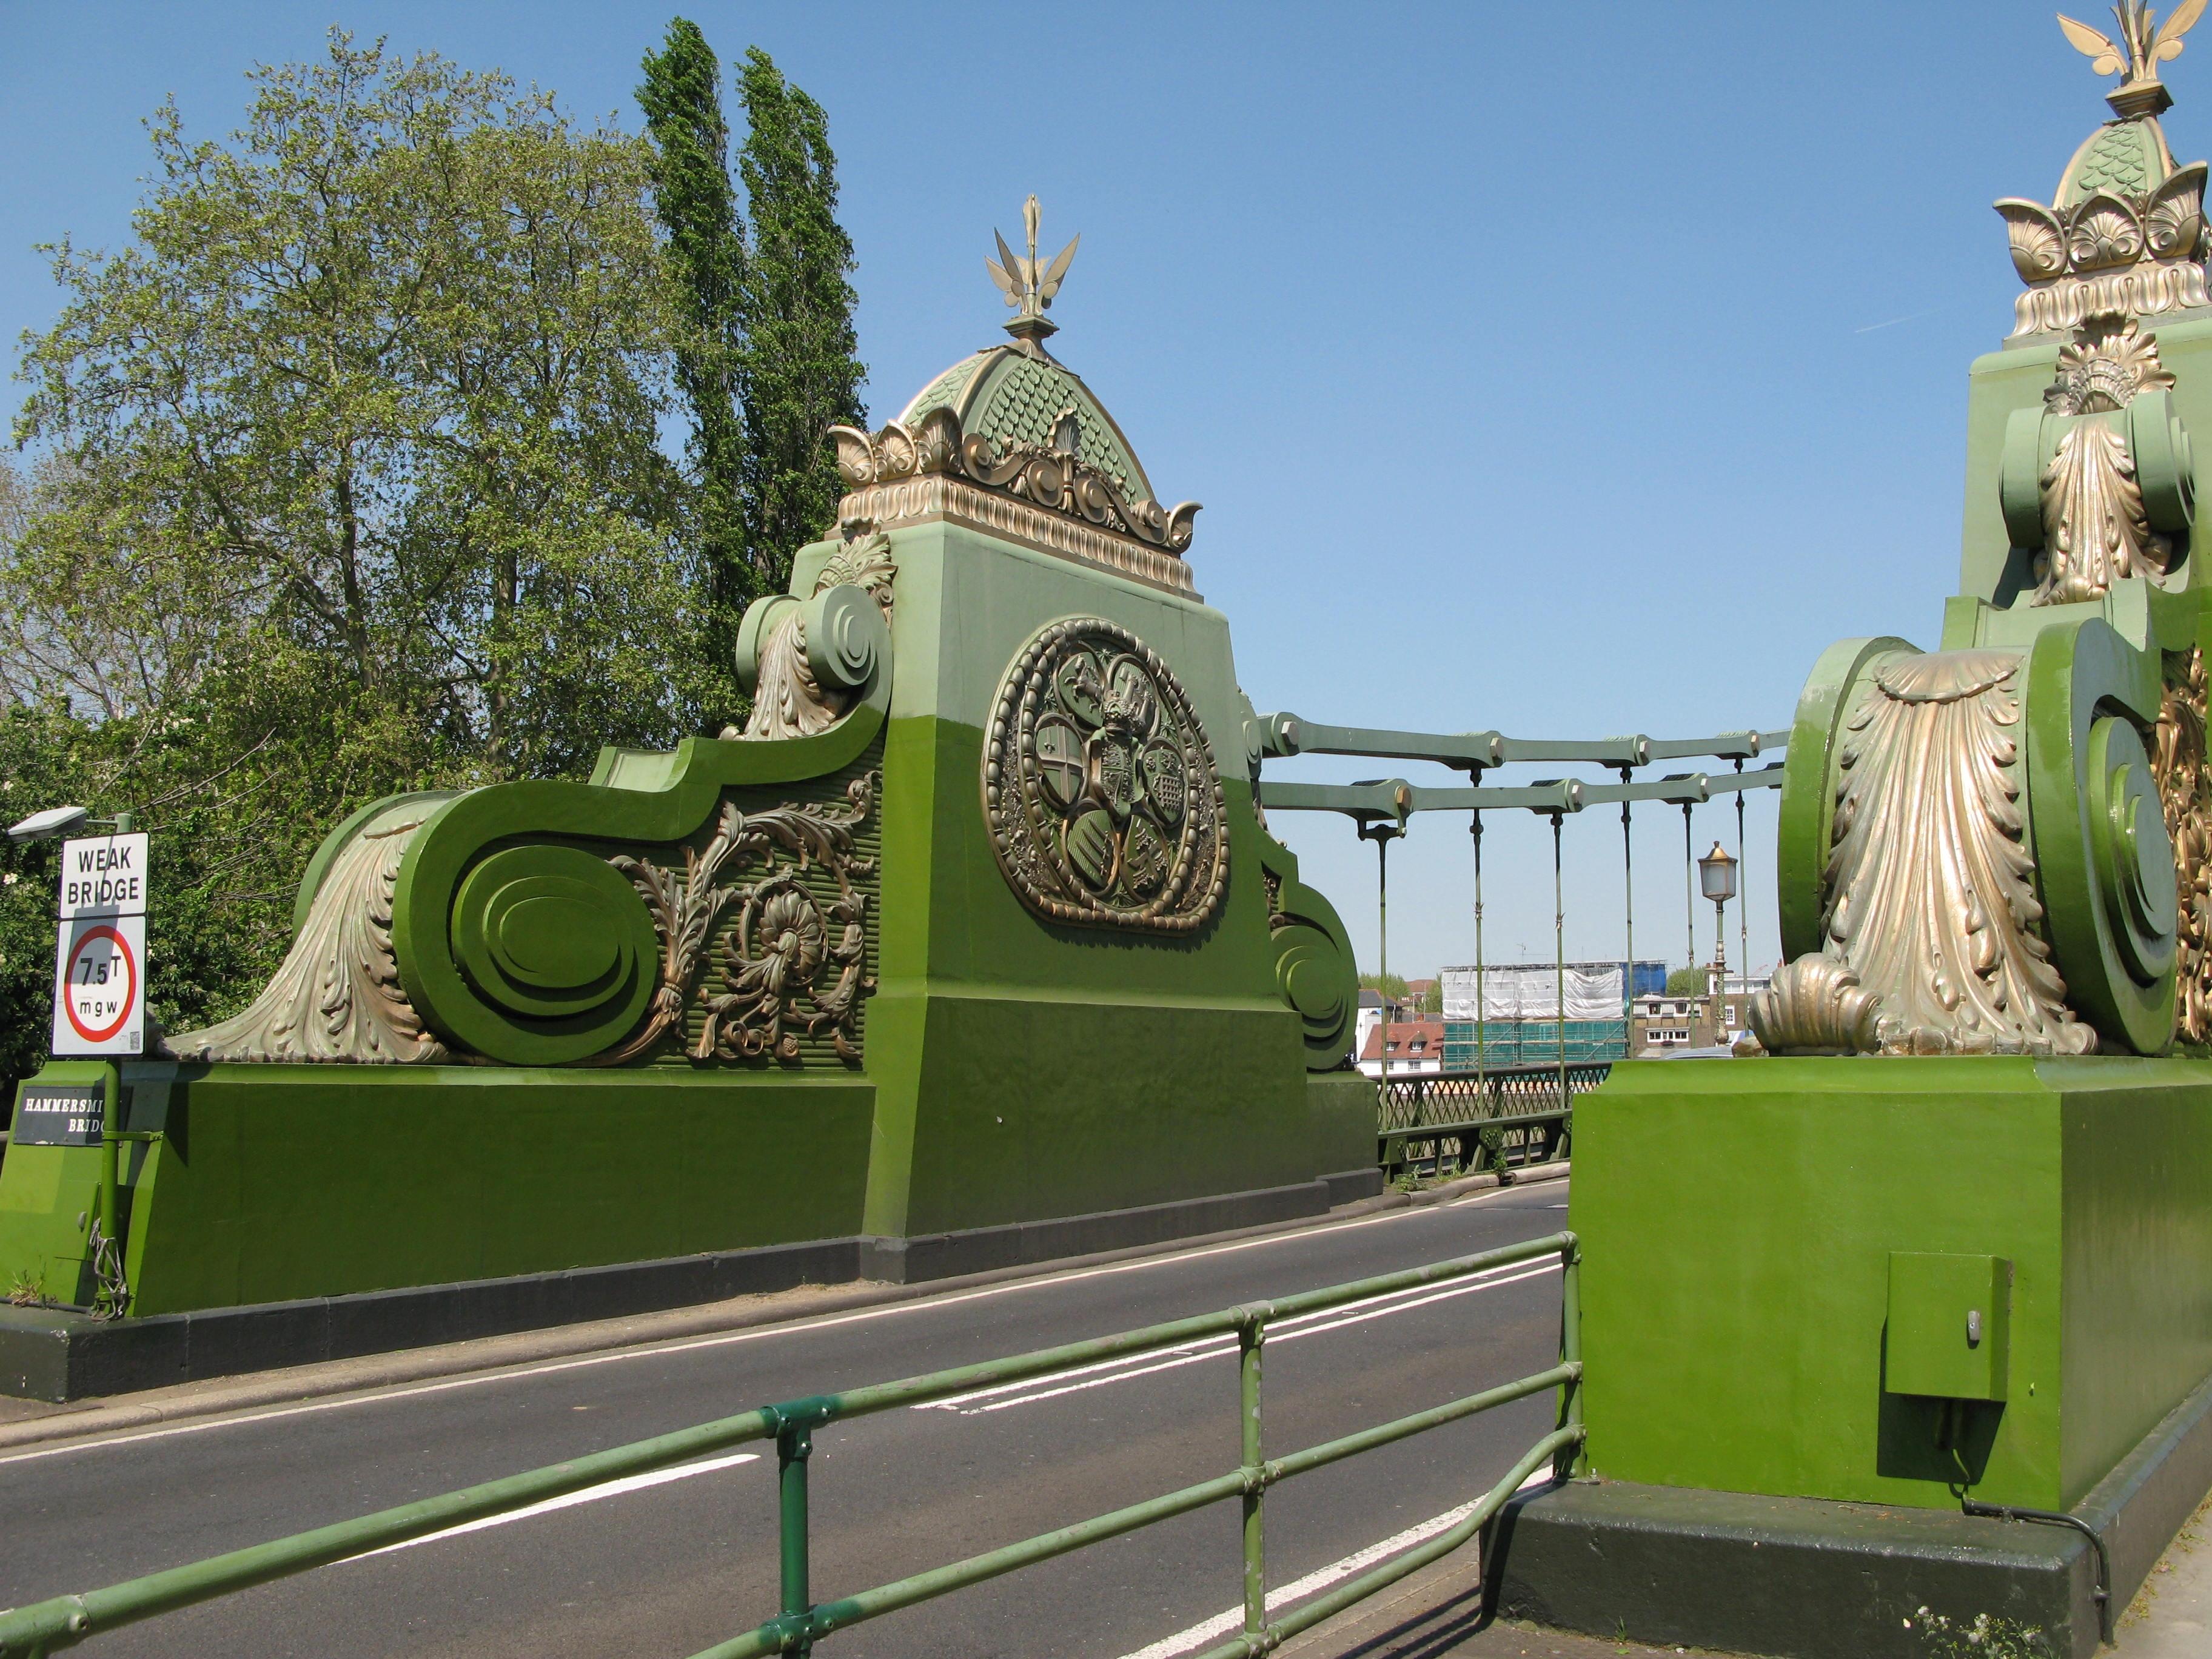 Hammersmith_Bridge_abutments